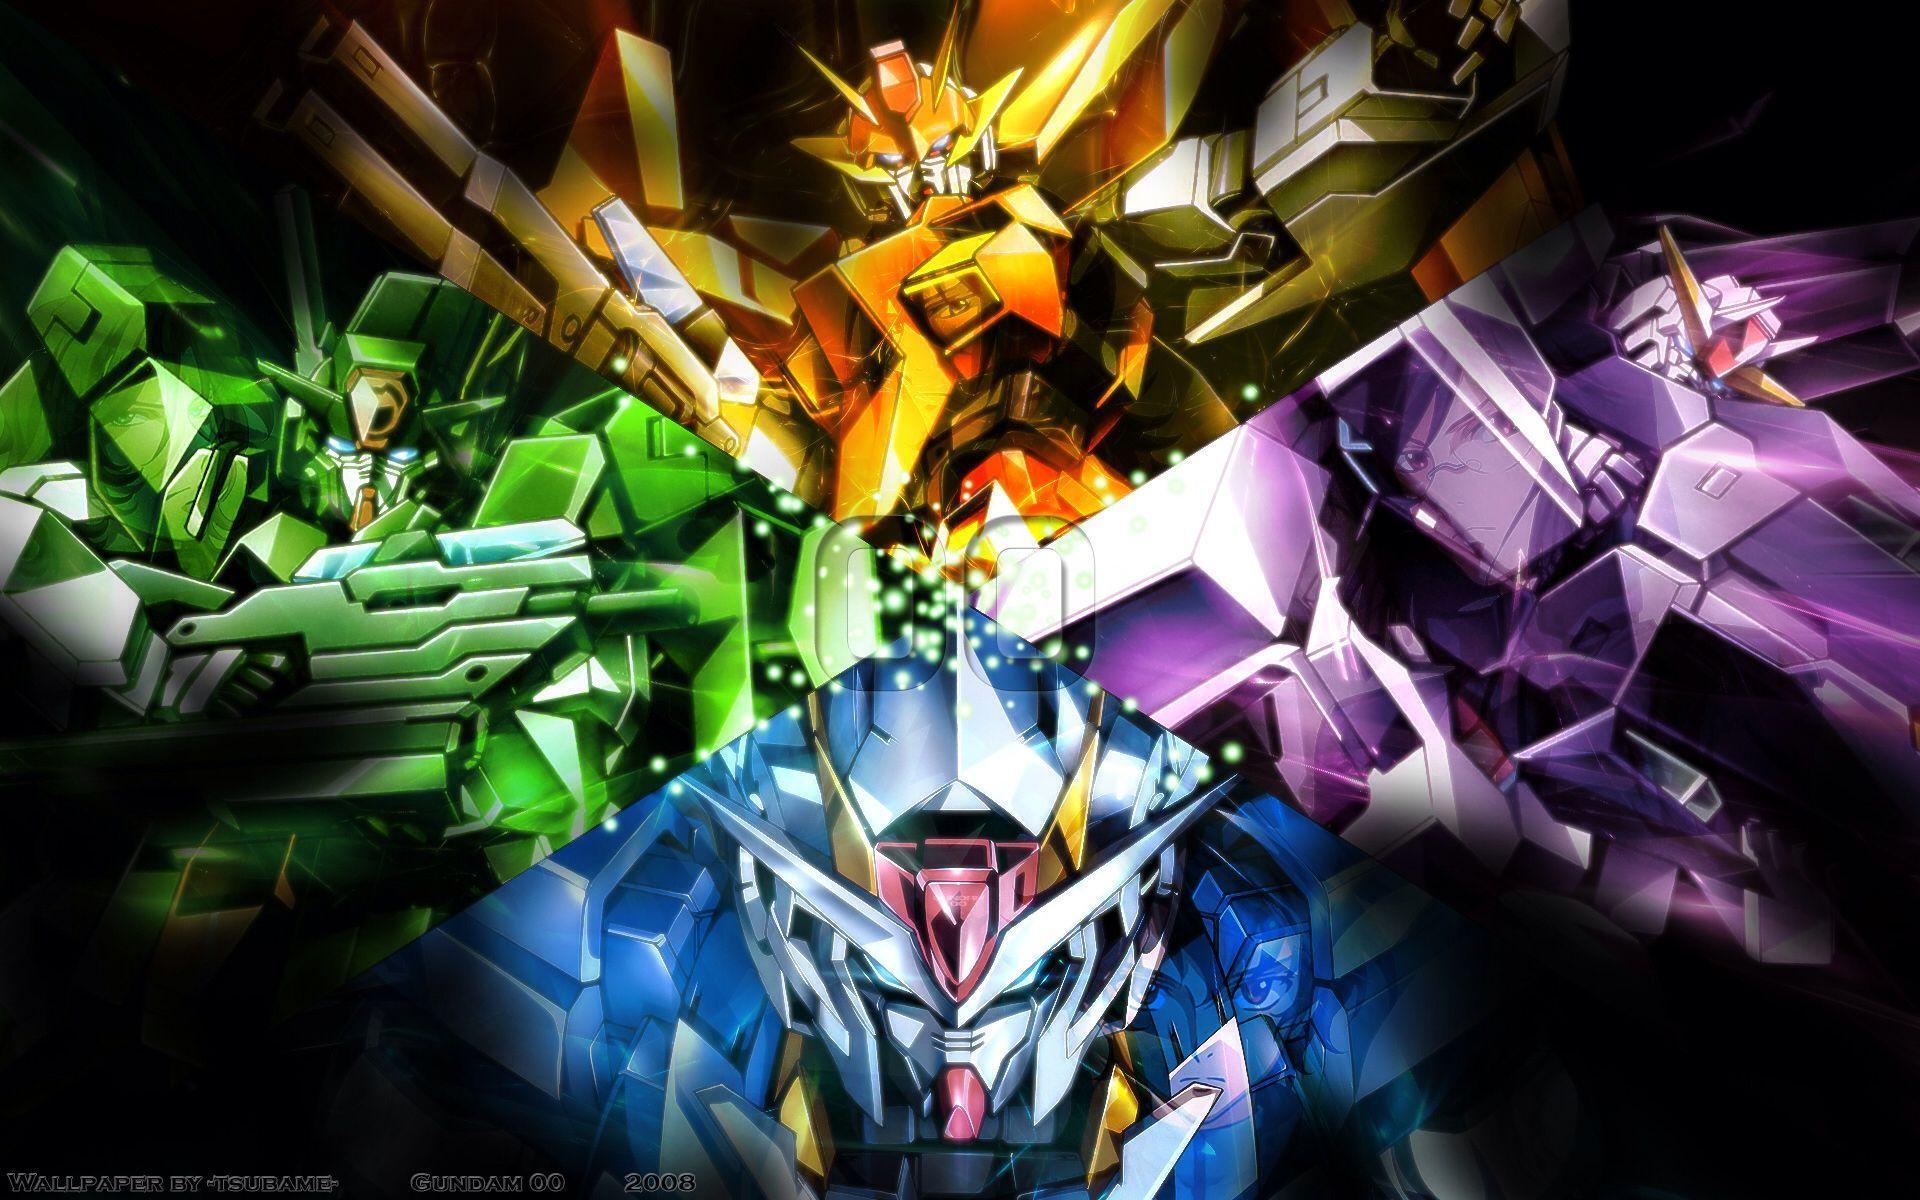 Mobile Suit Gundam 00 Wallpapers Top Free Mobile Suit Gundam 00 Backgrounds Wallpaperaccess